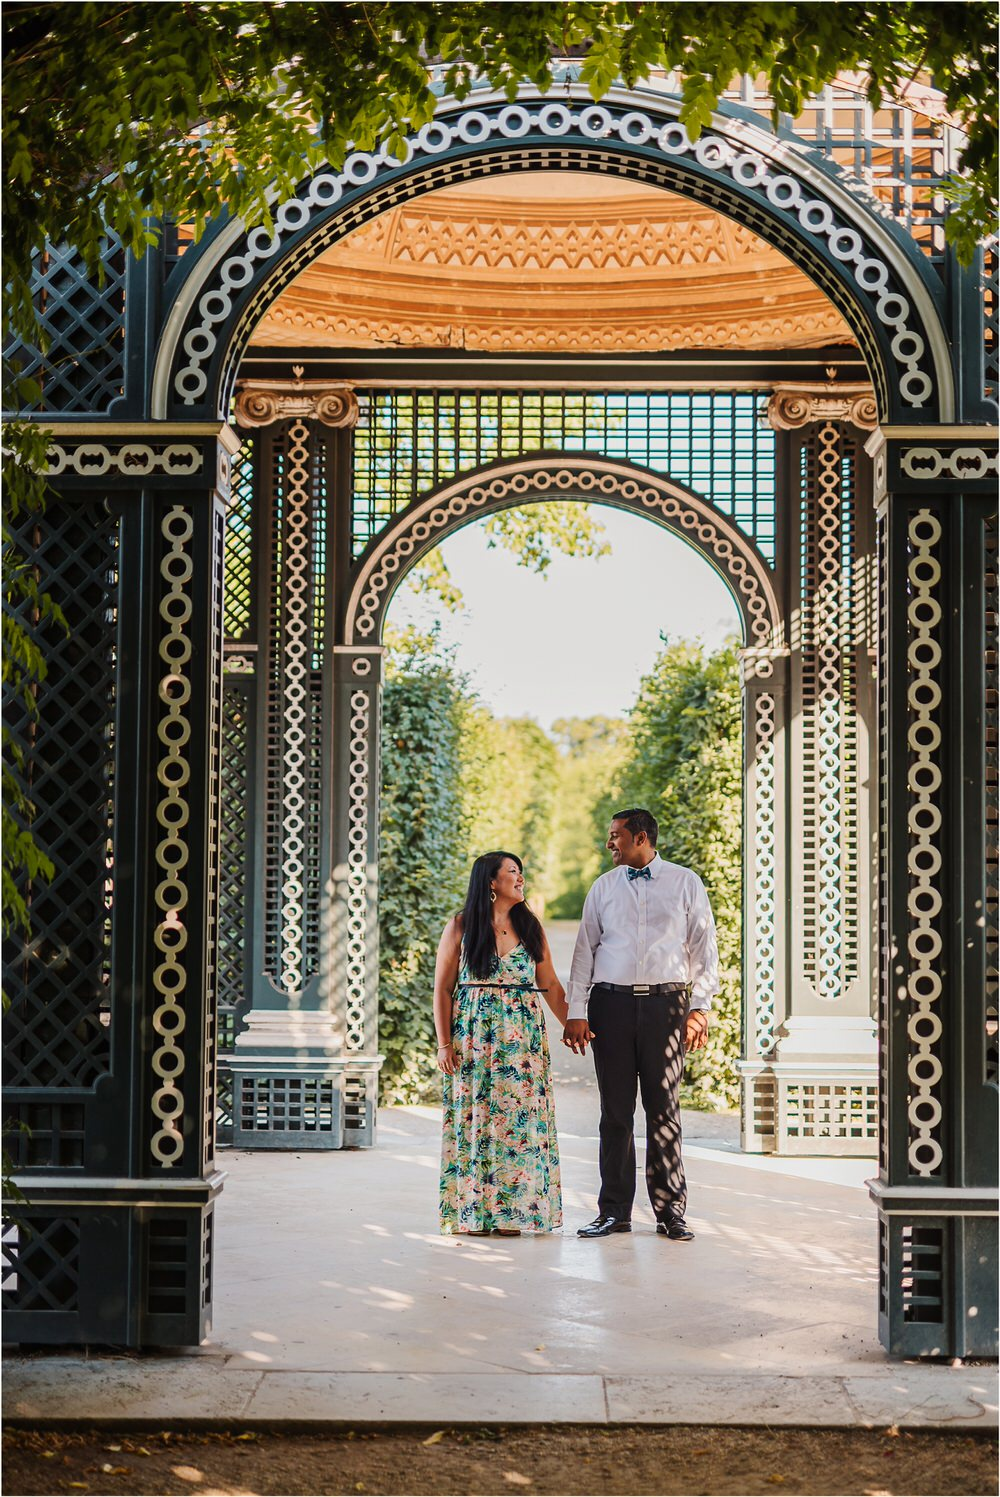 Tuscany wedding photographer destination italy italia france greece santorini 0101.jpg